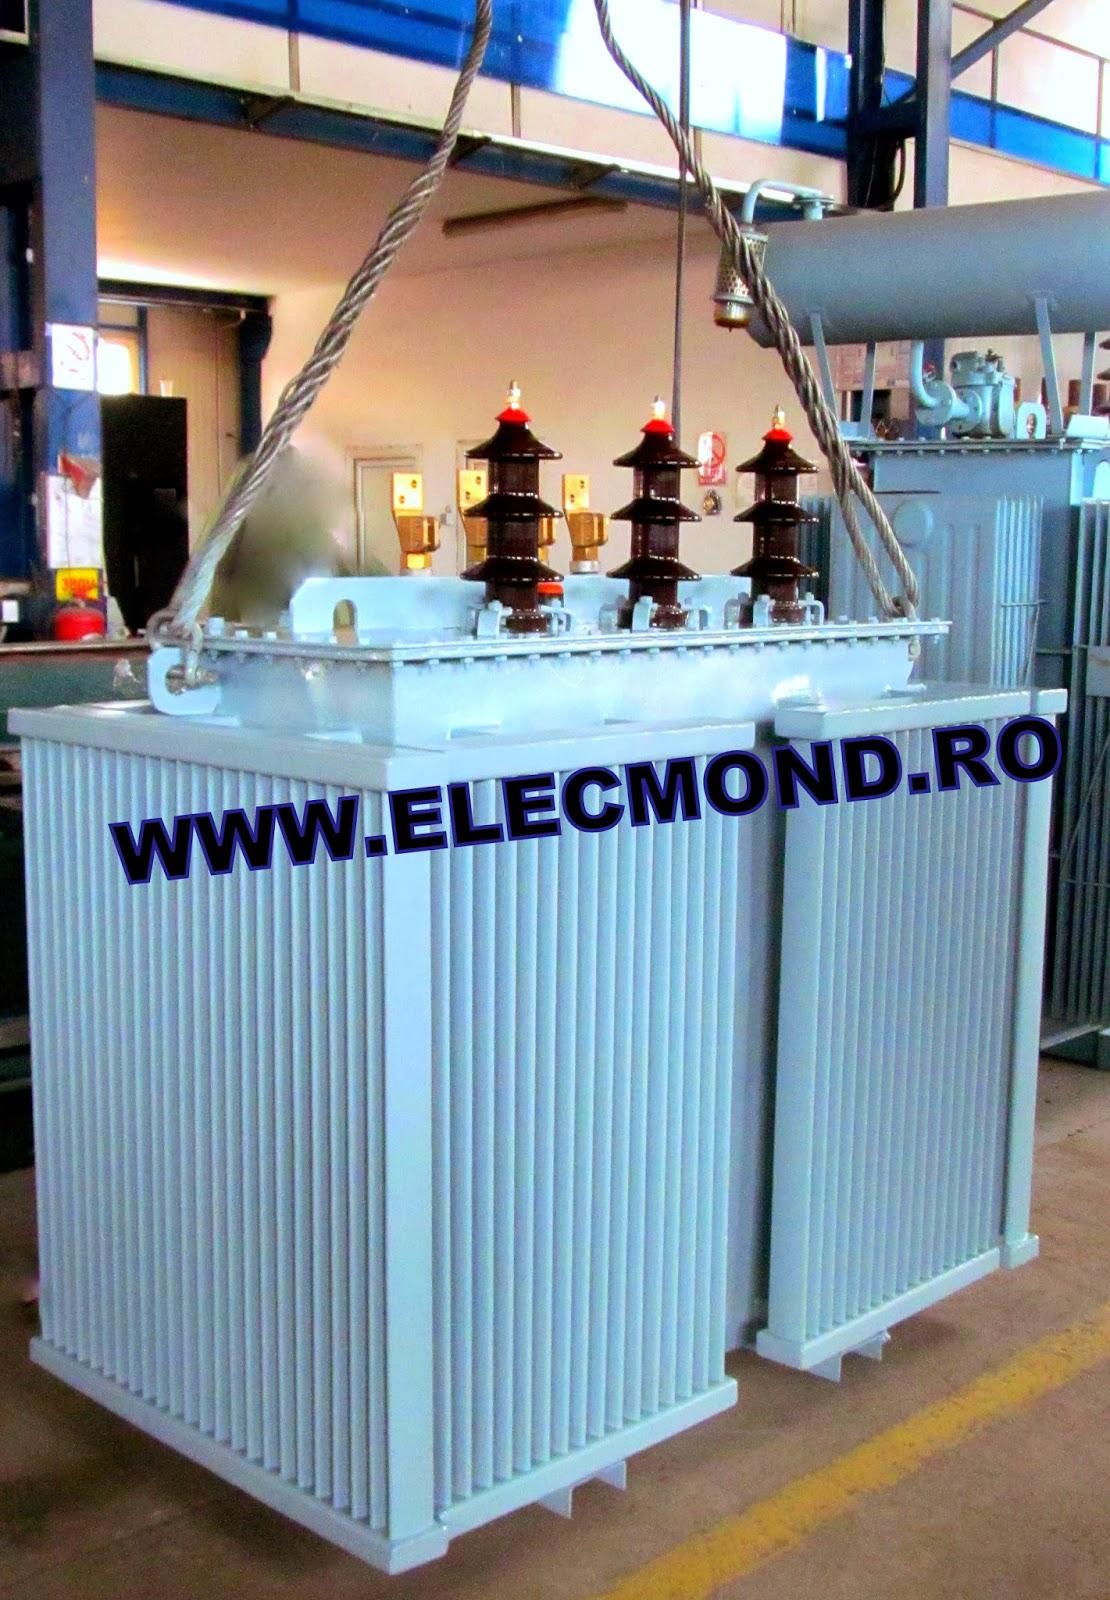 transformator 630 kVA,Oferta transformatoare ,, elecmond  , transformatoare electrice , transformator , preturi transformatoare , transformator de putere , 1000kVA, 1600kVA, 400kVA , 2000kVA, 630kVA